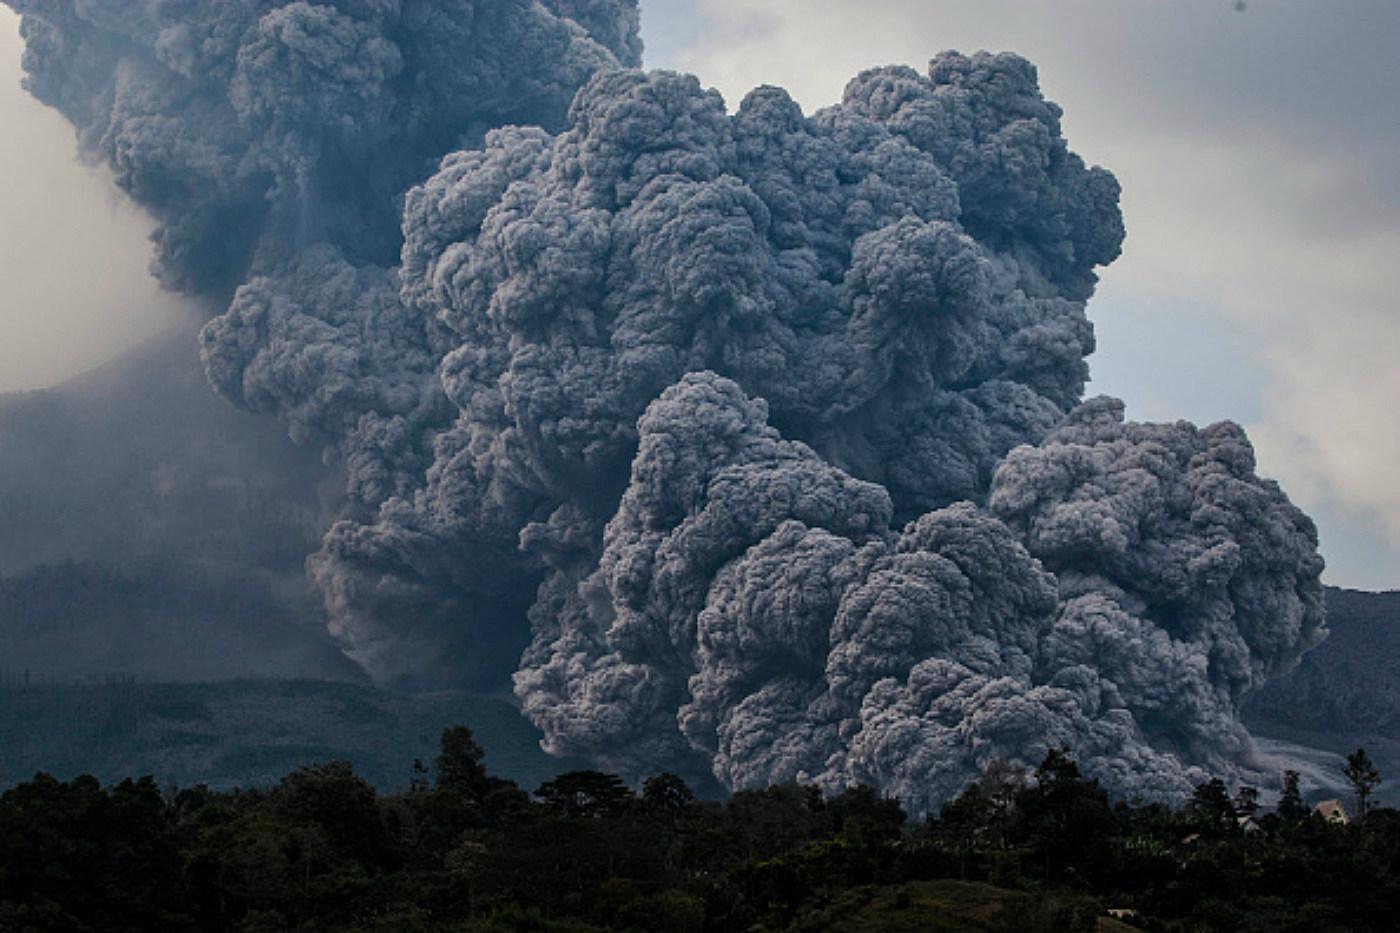 Ulet Ifansasti, Getty Images